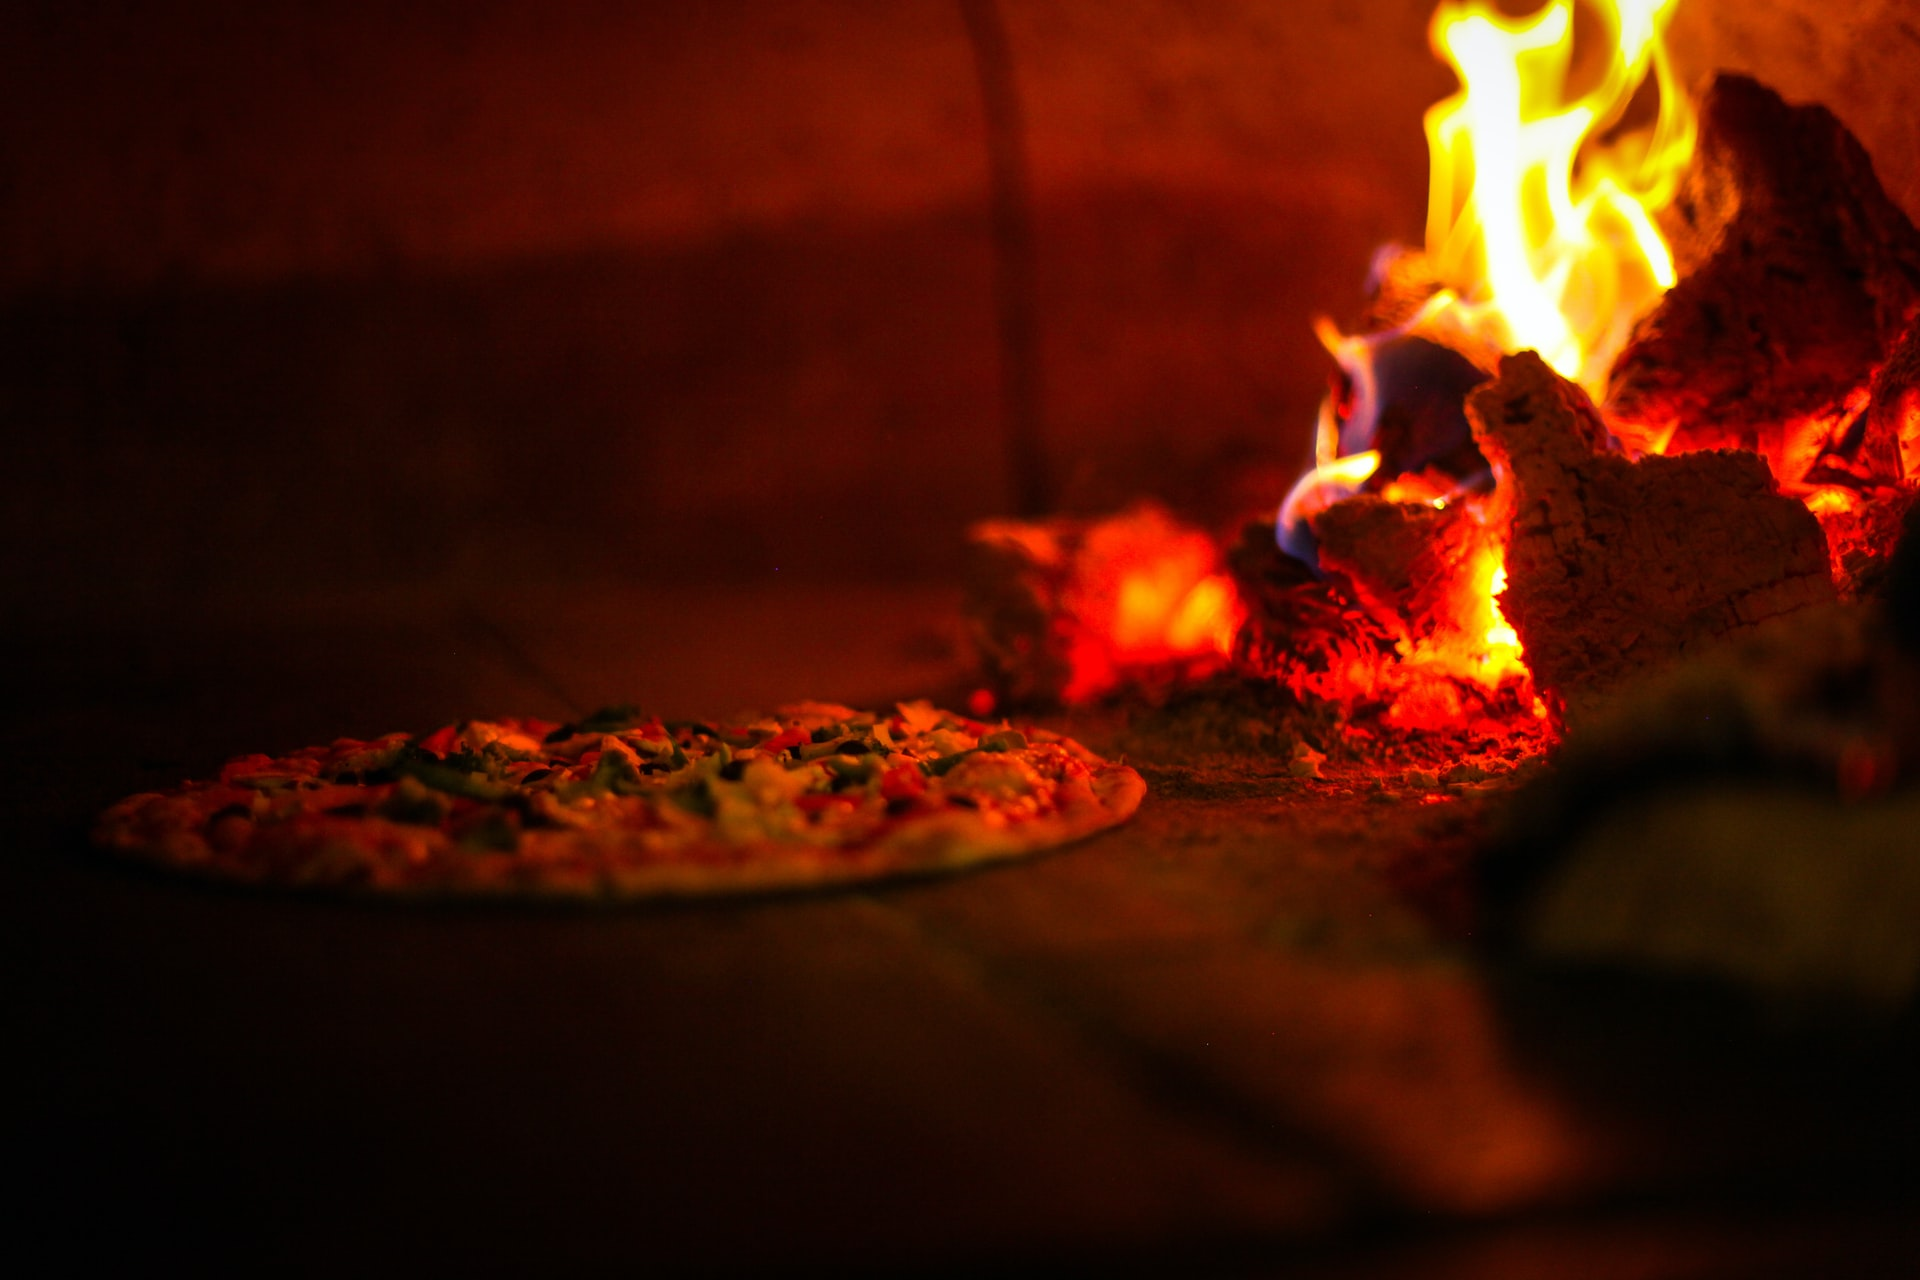 thumbnail image for blog Menomale Brings Neapolitan Pizza to DC